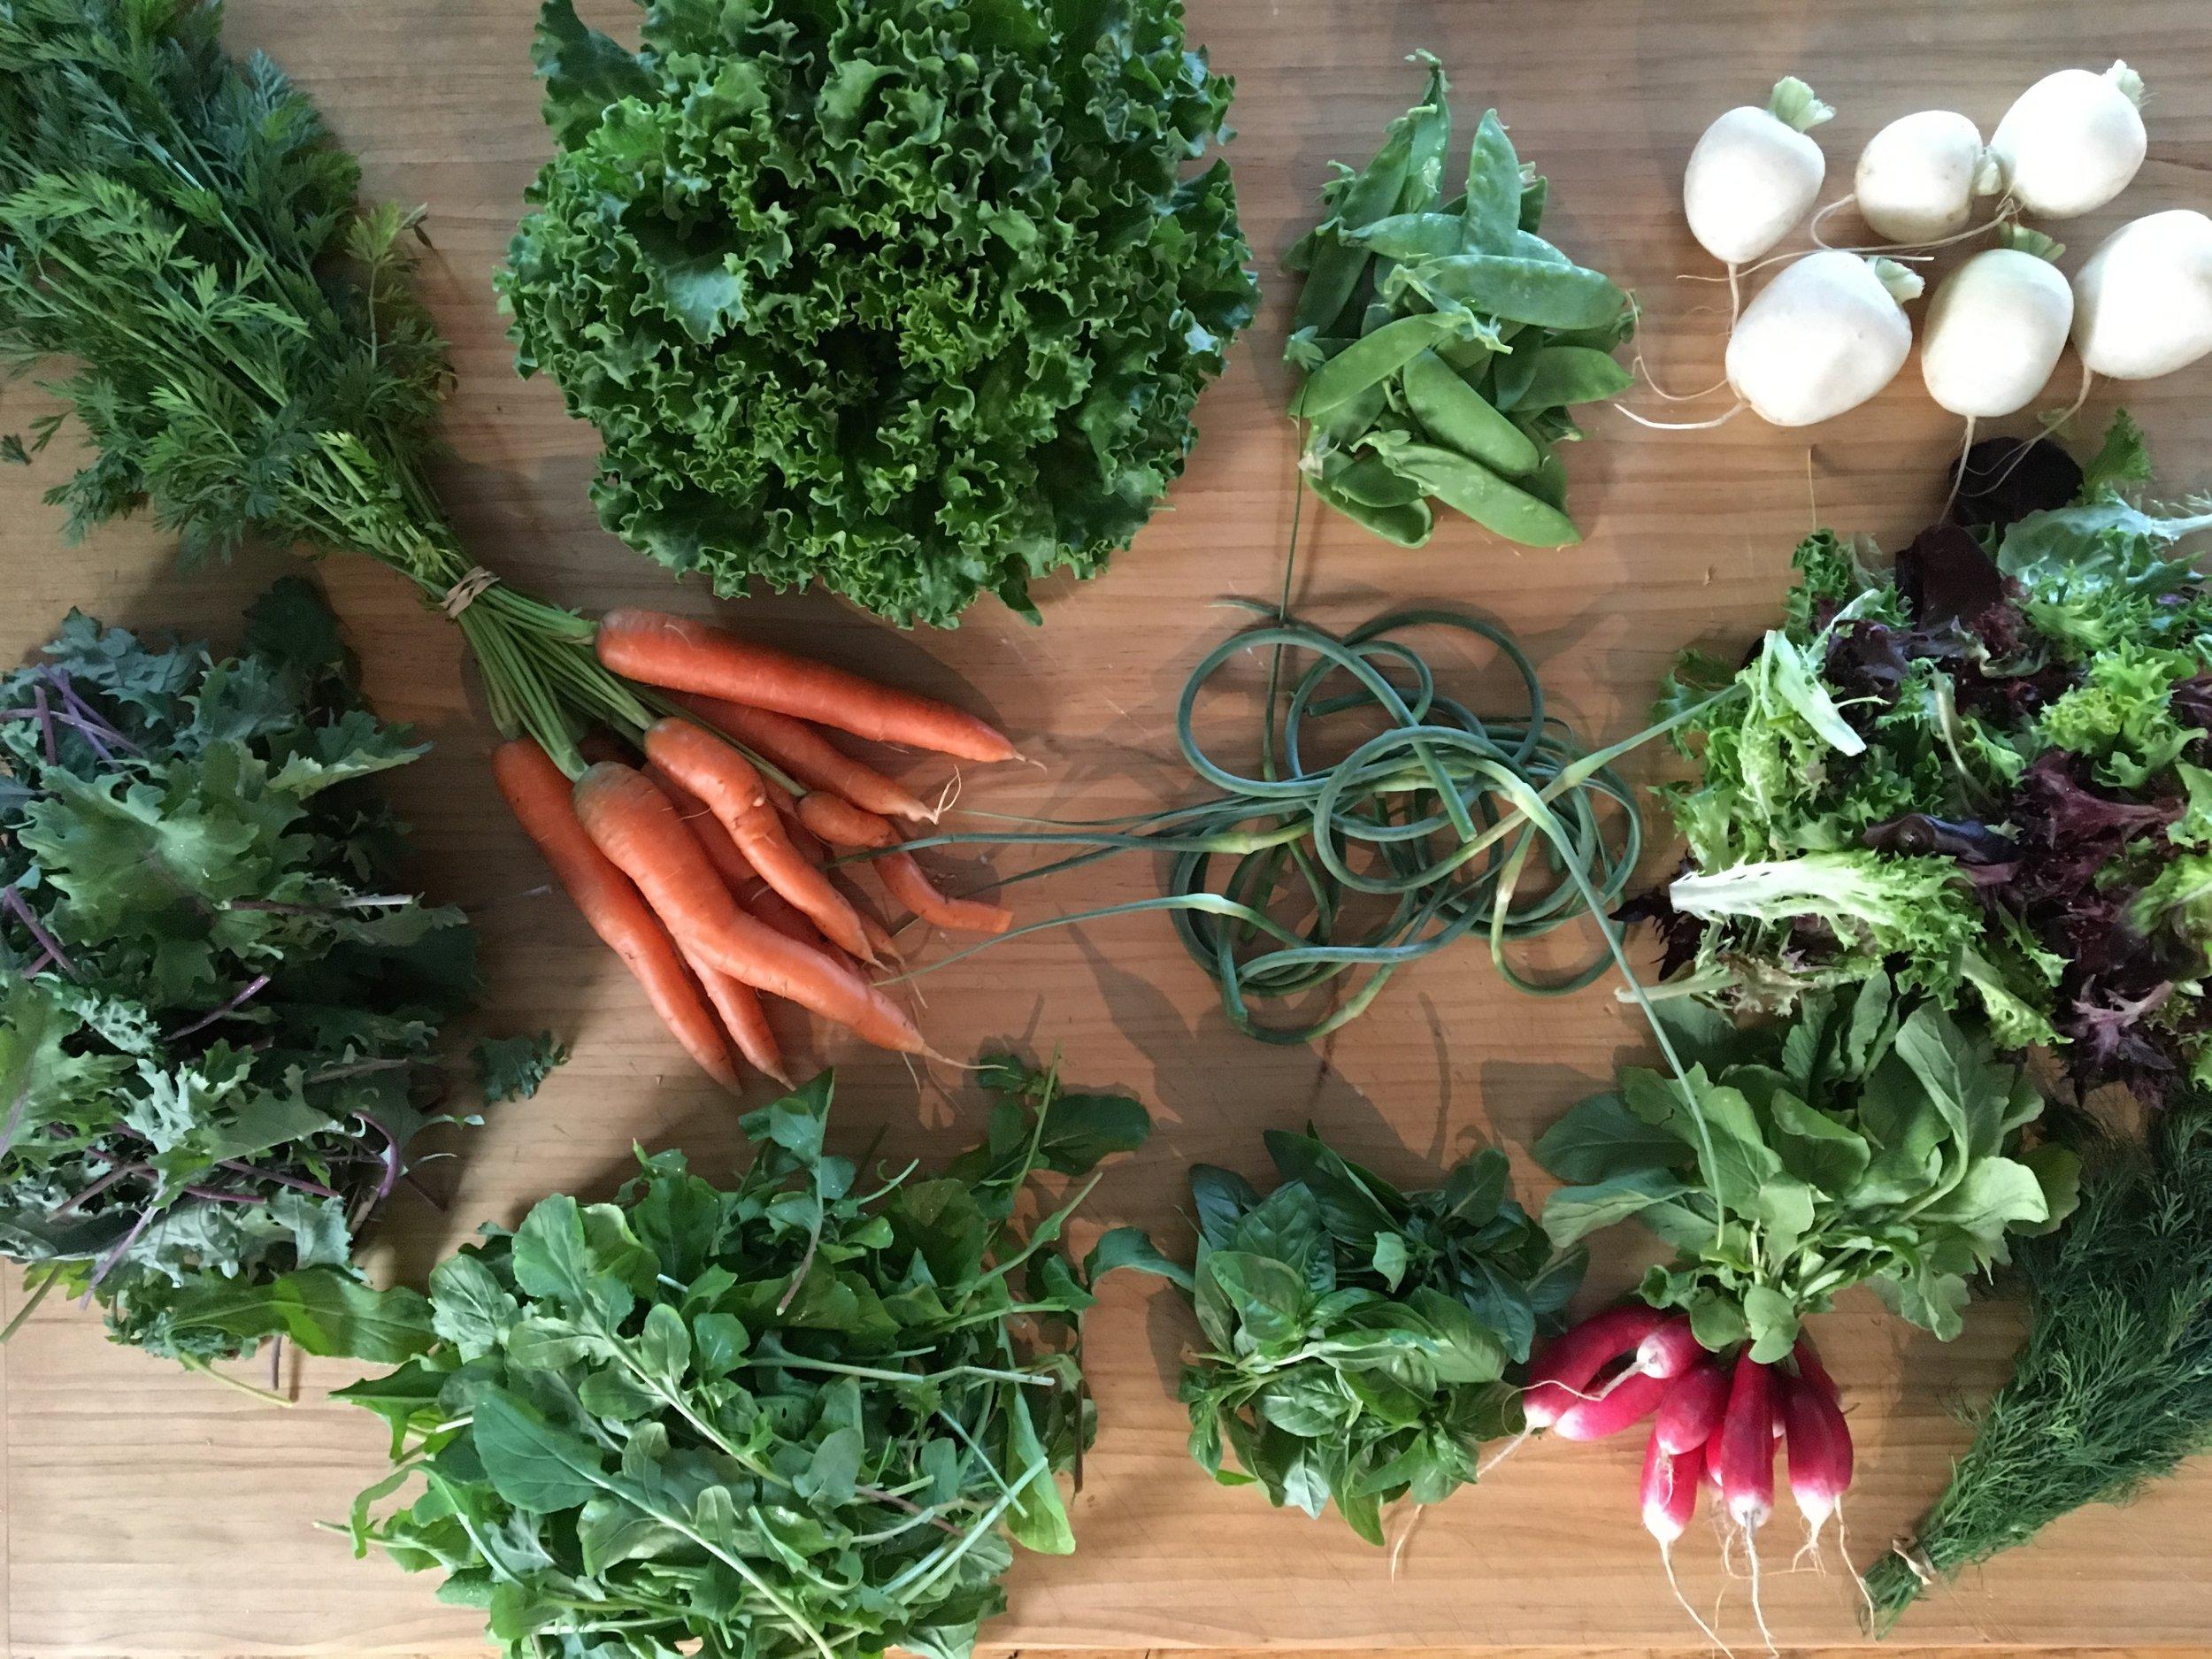 CSA Week #3 - Carrots, Head Lettuce, Snow Peas, Hakurei Turnips, Baby Kale, Garlic Scapes, Salad Greens, Arugula, Basil, Radishes and Dill.